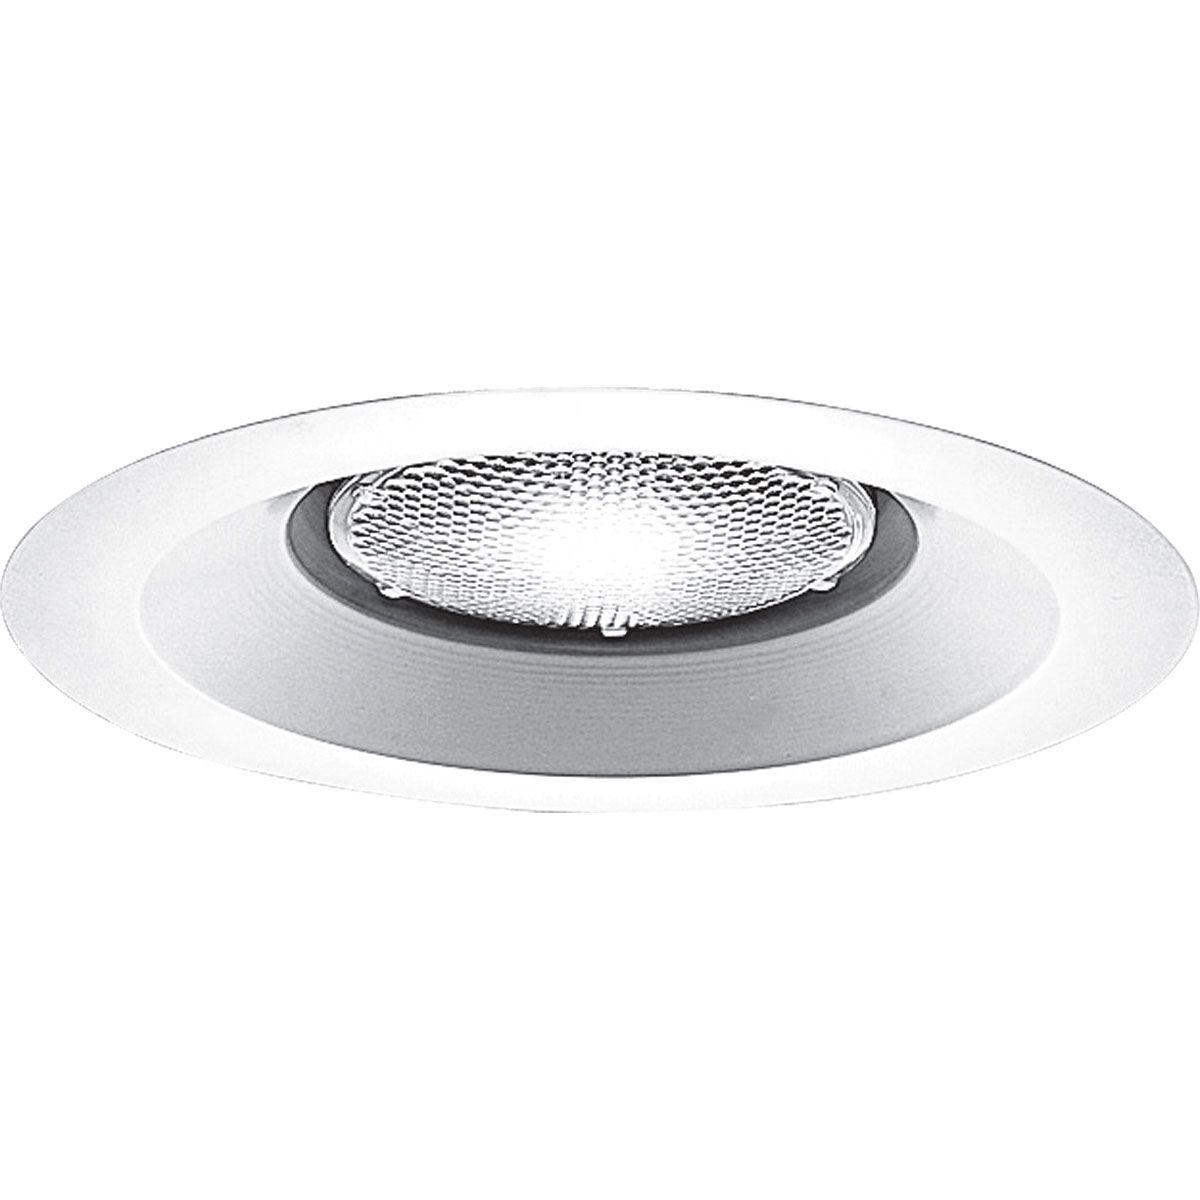 PROP8073-28 OPEN; BRIGHT WHITE; 6 INCH NOMINAL APERTURE SIZE; ROUND APERTURE SHAPE; BR40 120 W, PAR38 150 W FLUORESCENT LAMP; INSULATED CEILING; SIZE 7 3/4 INCH DIA; PROGRESS LIGHTING[R] BRAND, PROGRESS